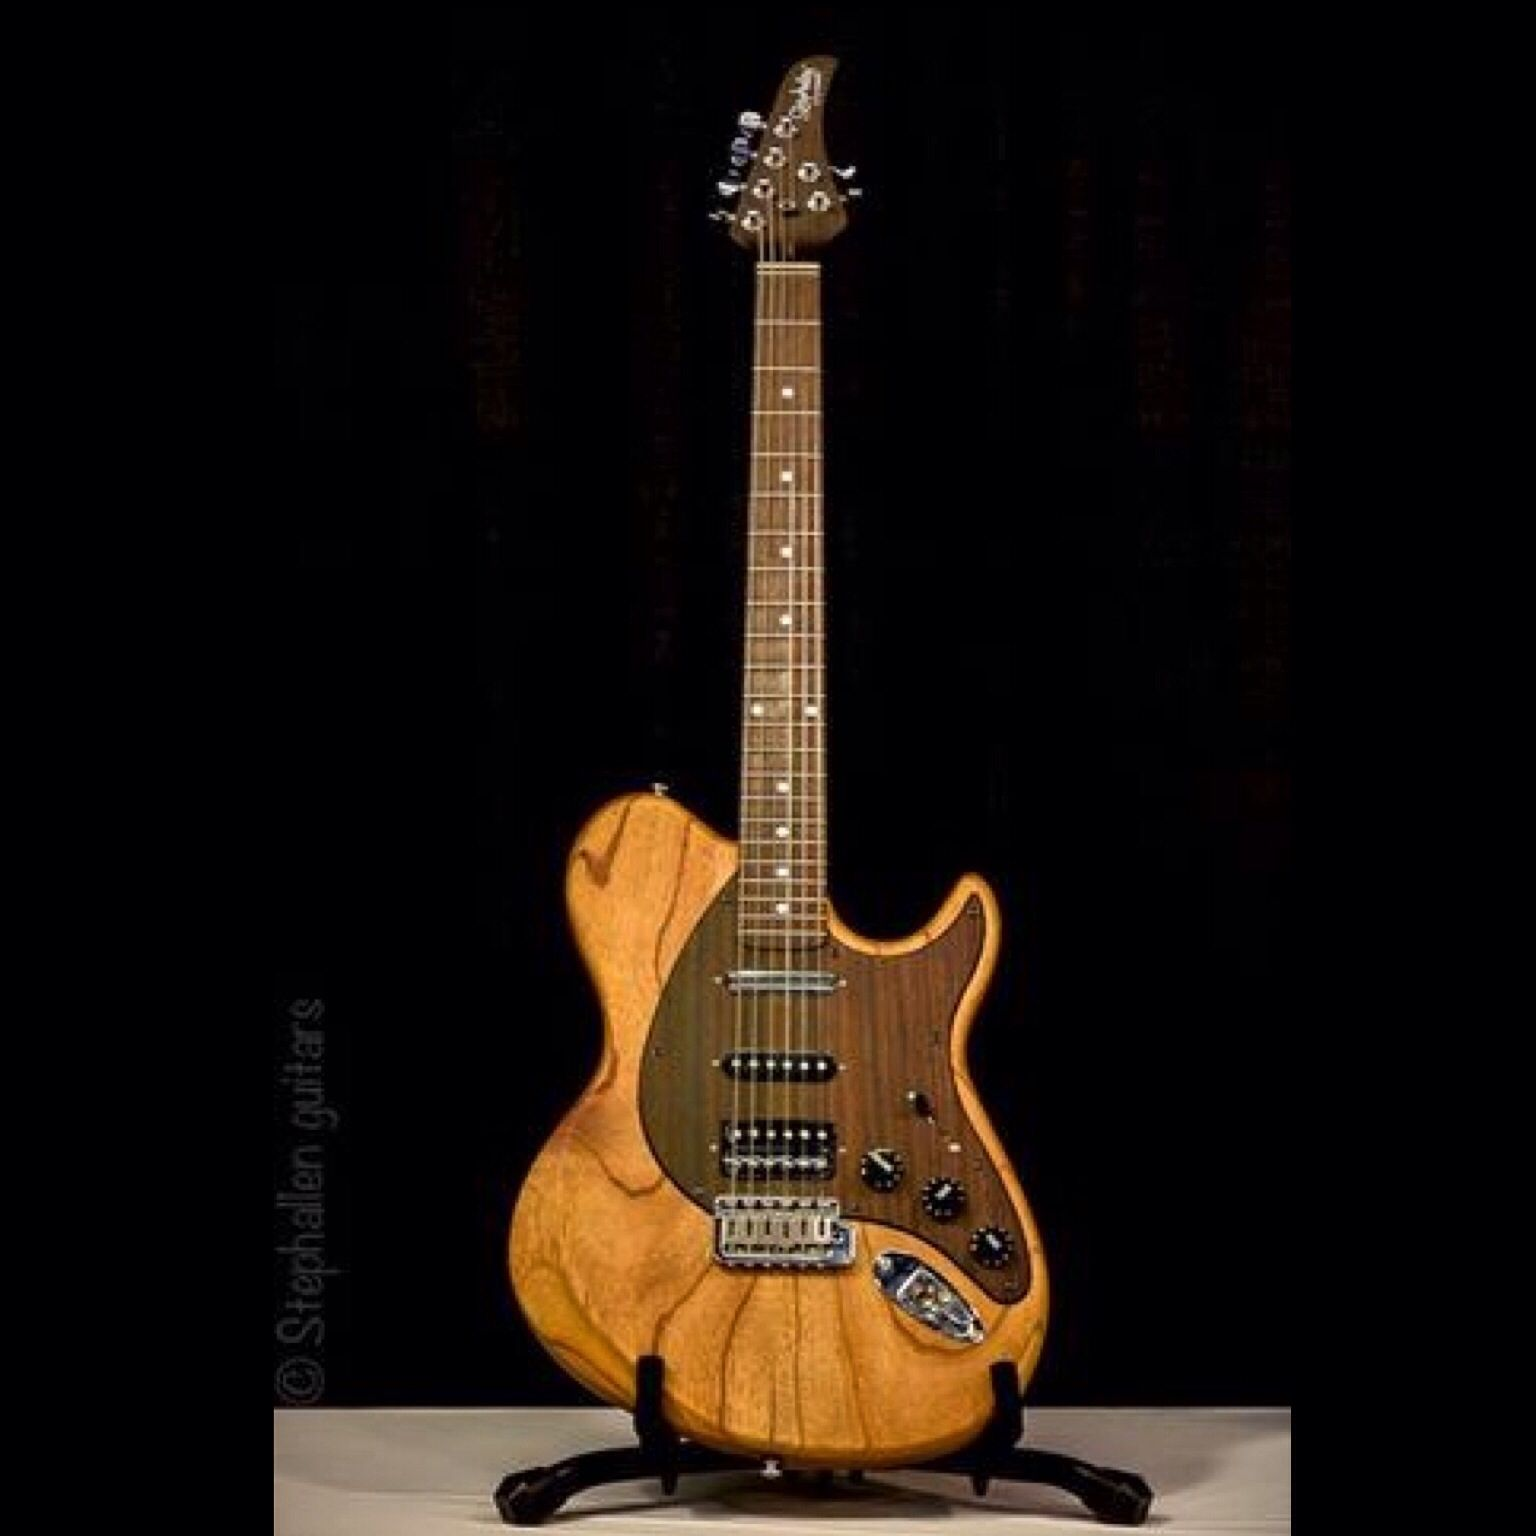 Stephallen Neoclassic #stephallen #guitars #neoclassic #vintage